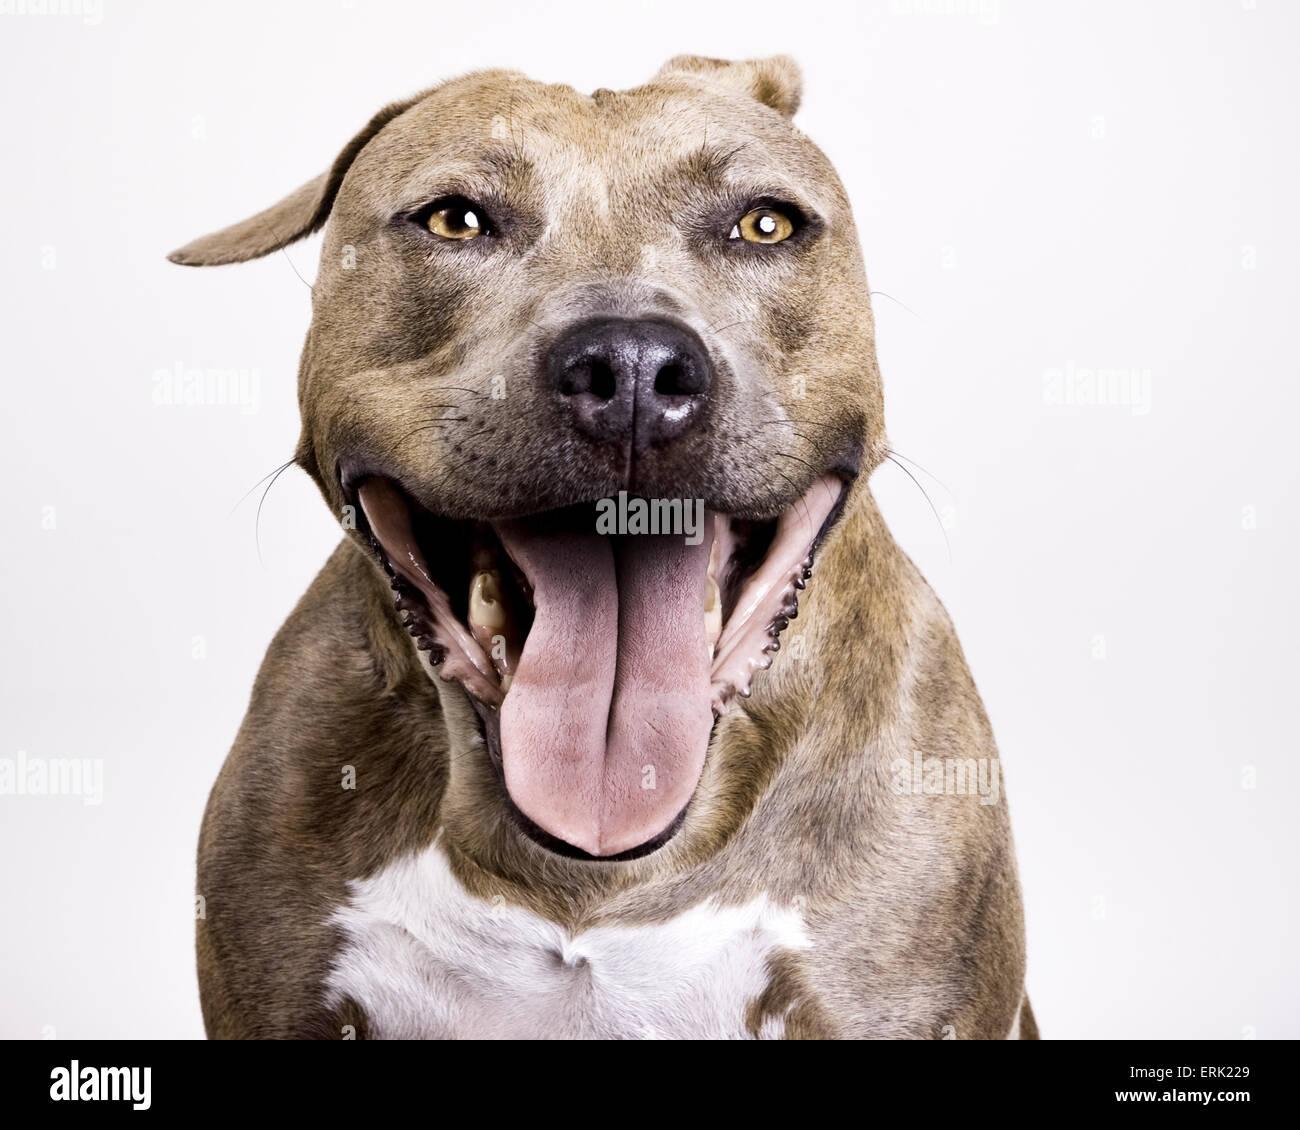 pitbull dog teeth stock photos pitbull dog teeth stock images alamy